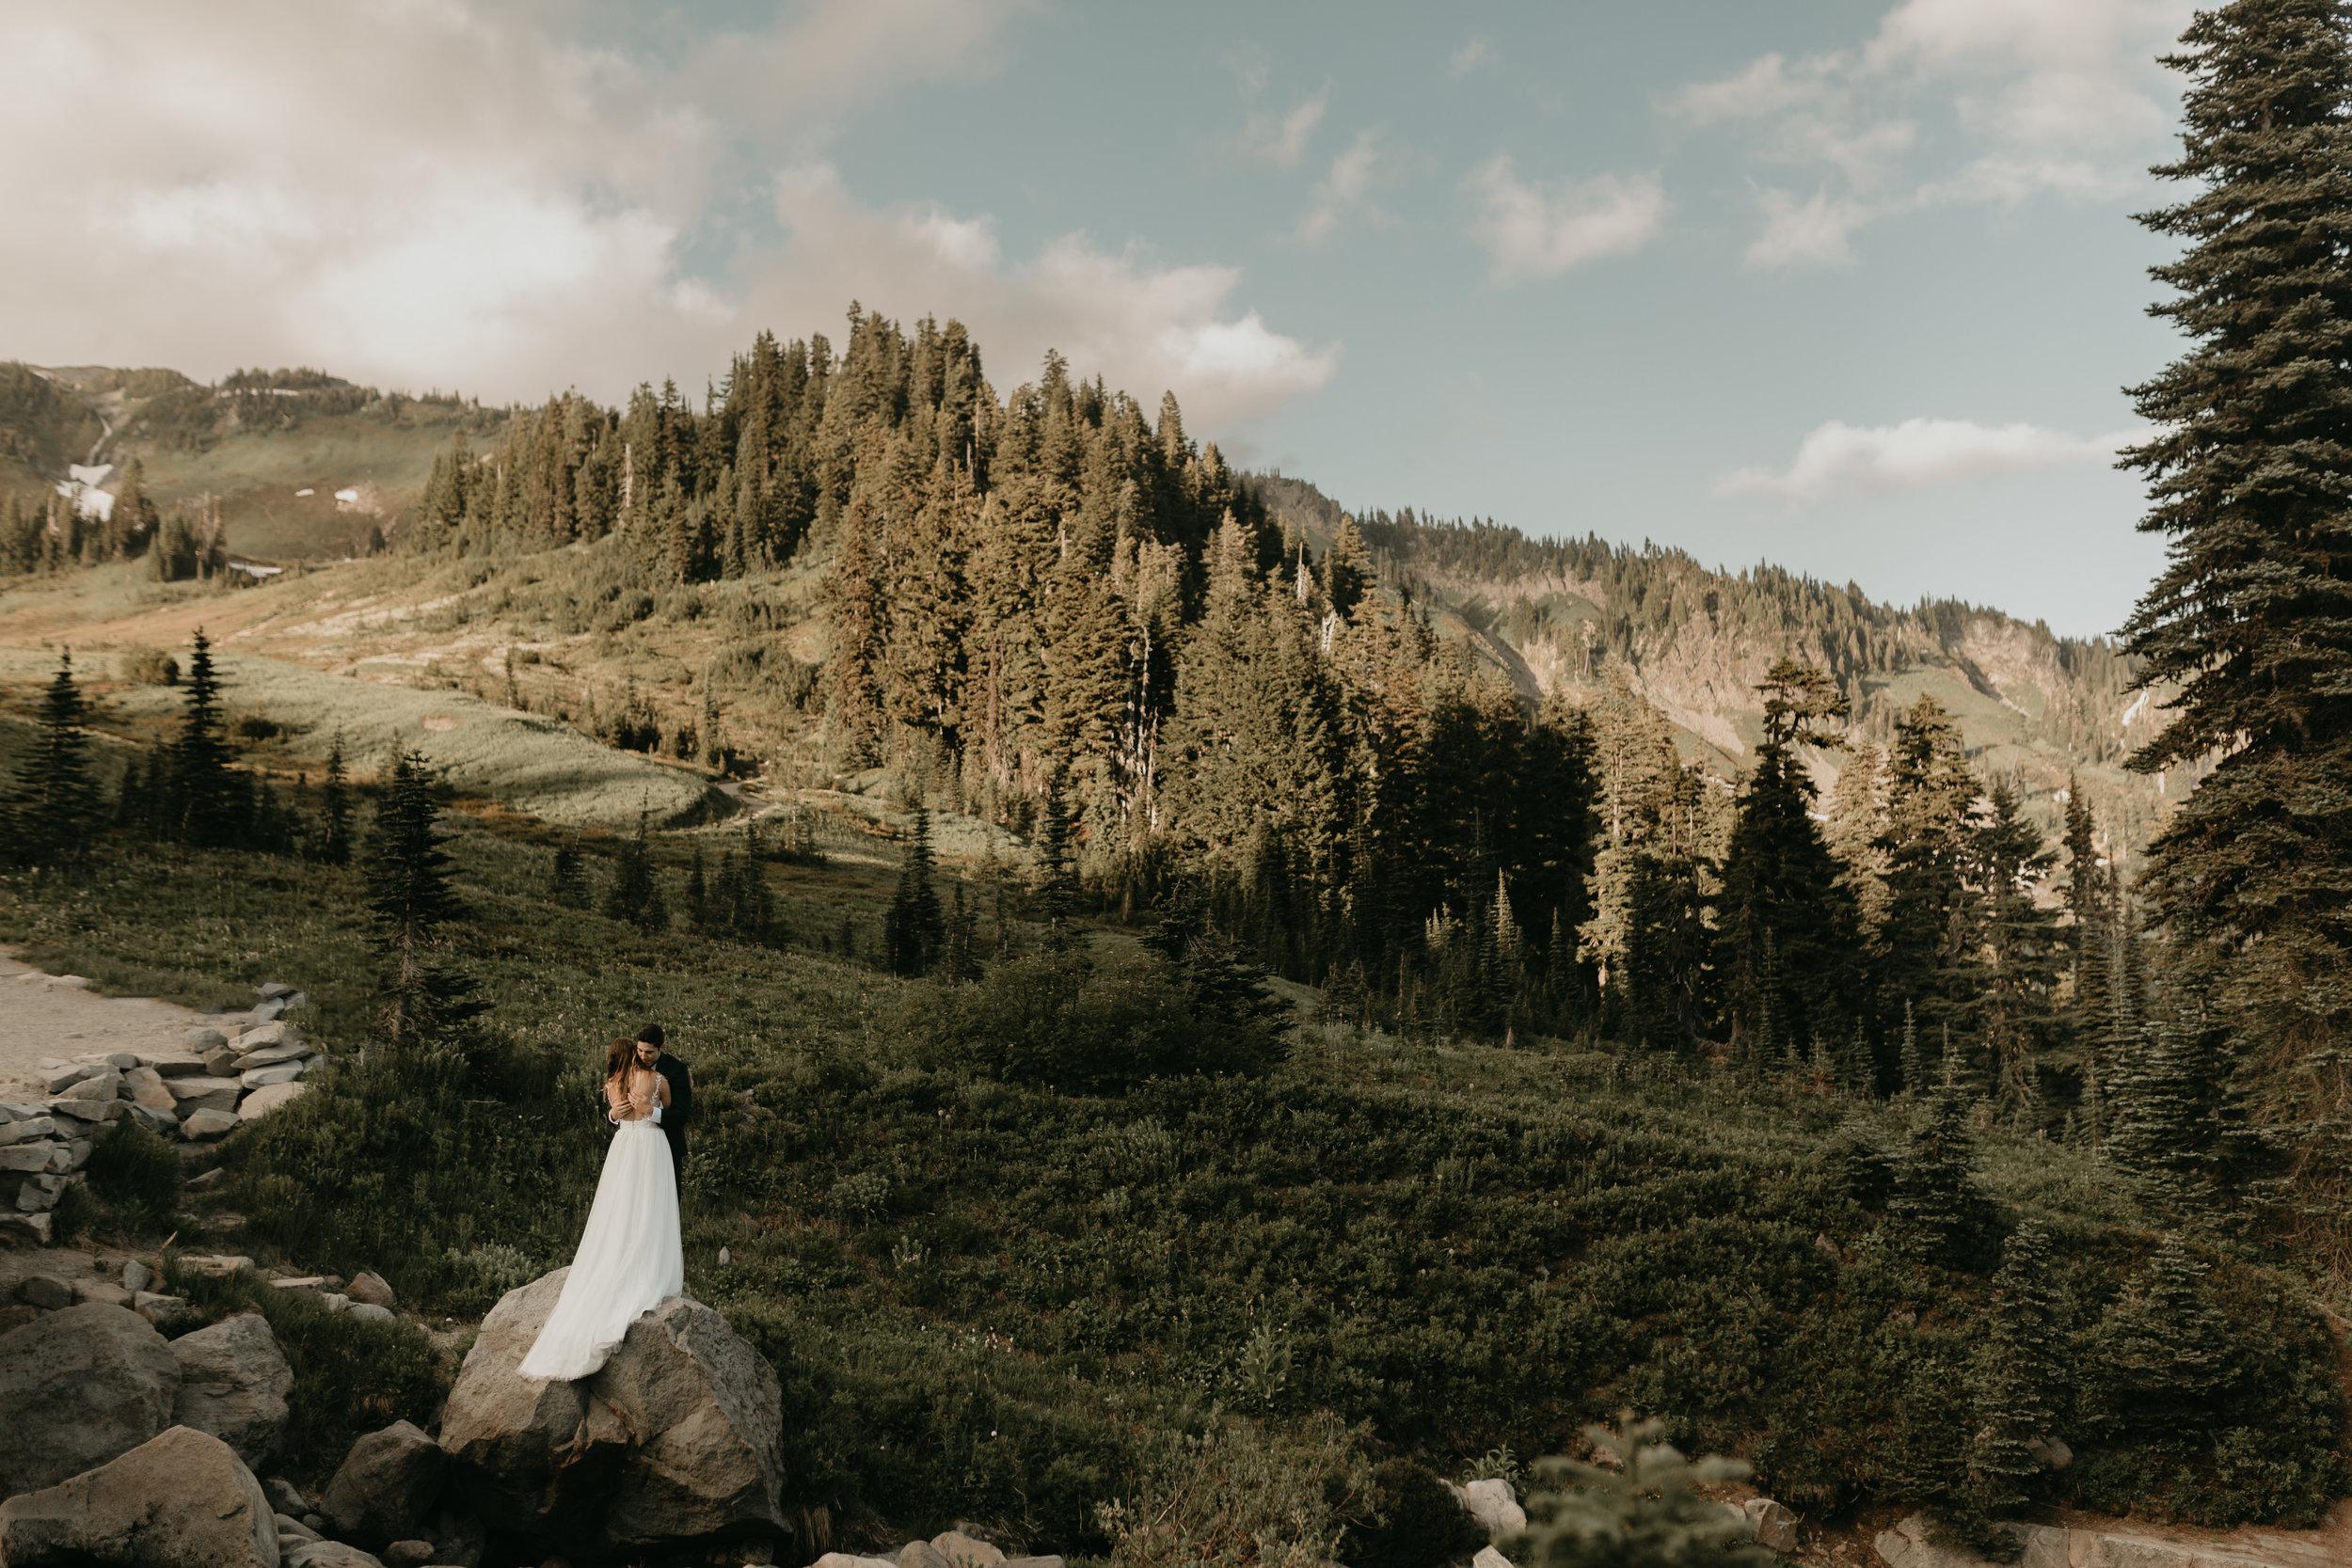 Nicole-Daacke-Photography-Mt-Rainier-elopement-photographer-washington-mountain-epic-wedding-photography-wildflowers-at-rainier-pine-tree-cloudy-summer-day-at-mountain-rainier-19.jpg